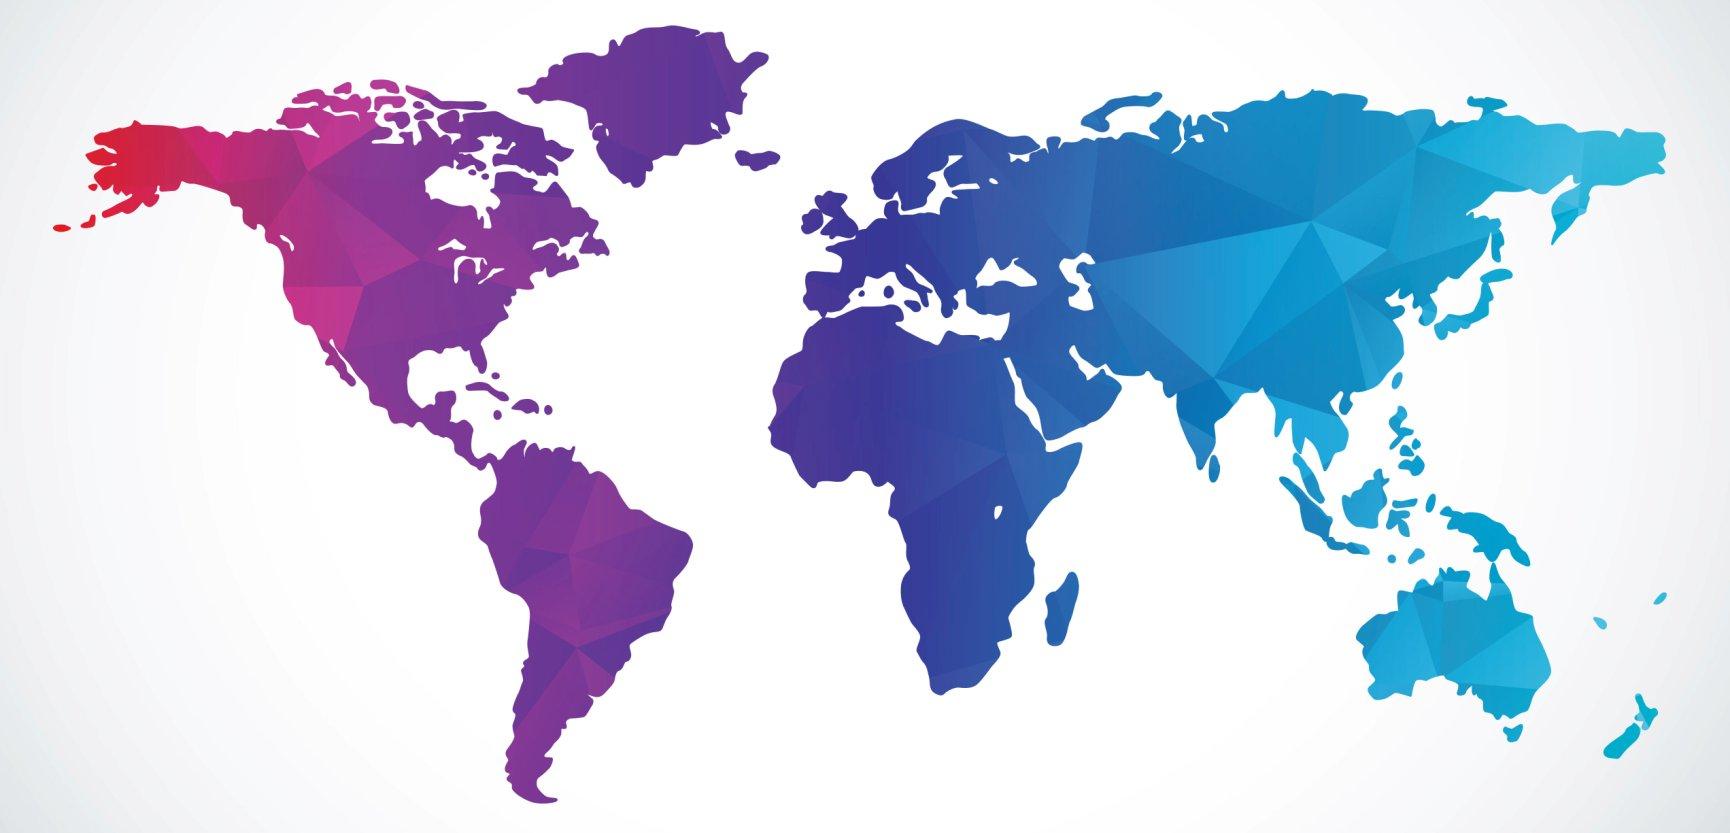 Worldwide Shipment